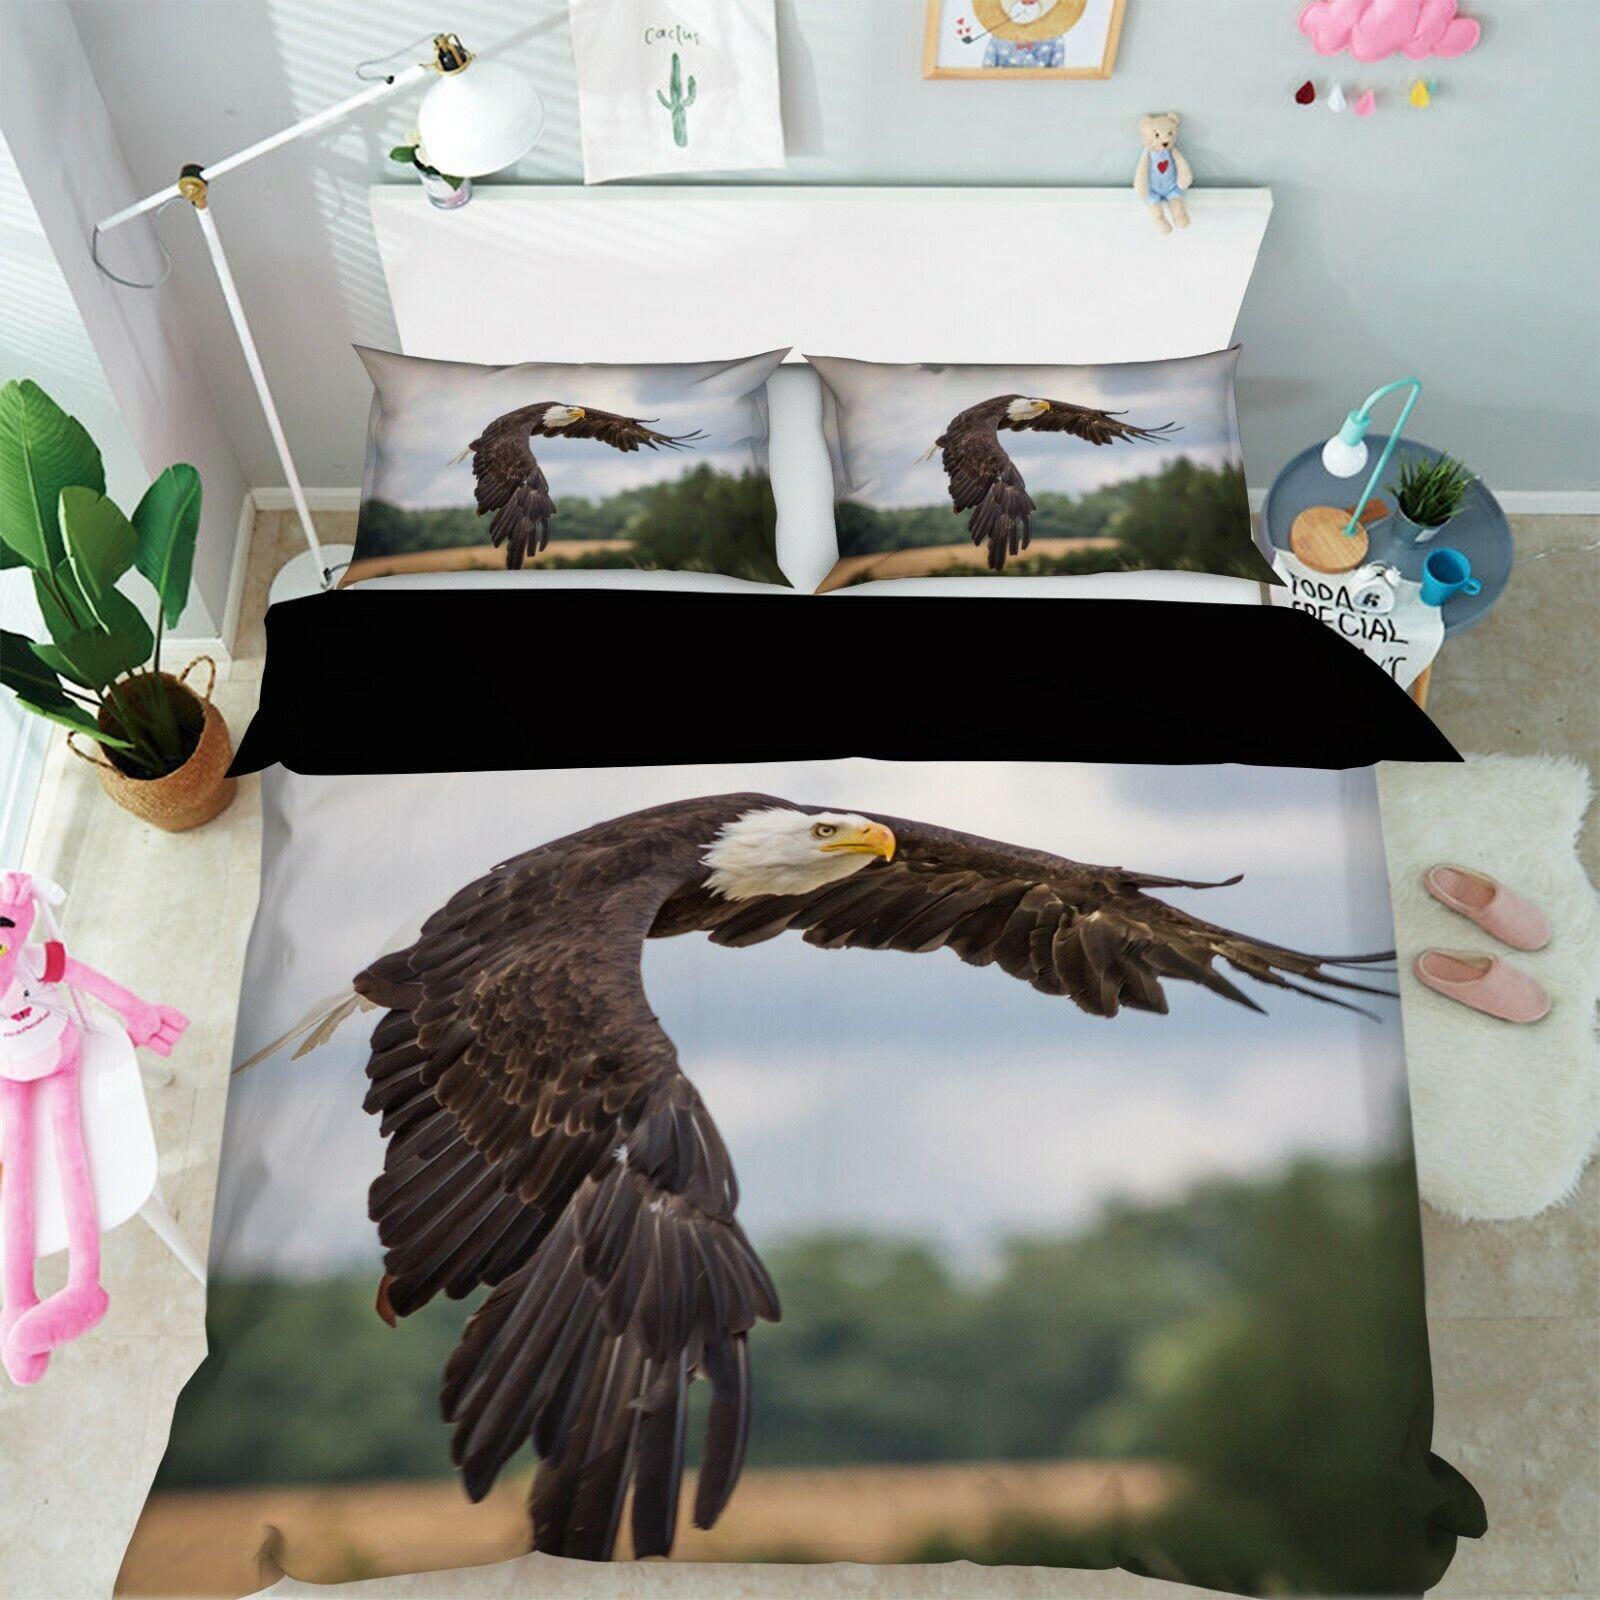 3D Prairie Eagle R101 Animal Bett Pillowcases Quilt Duvet Startseite Königin König Zoe